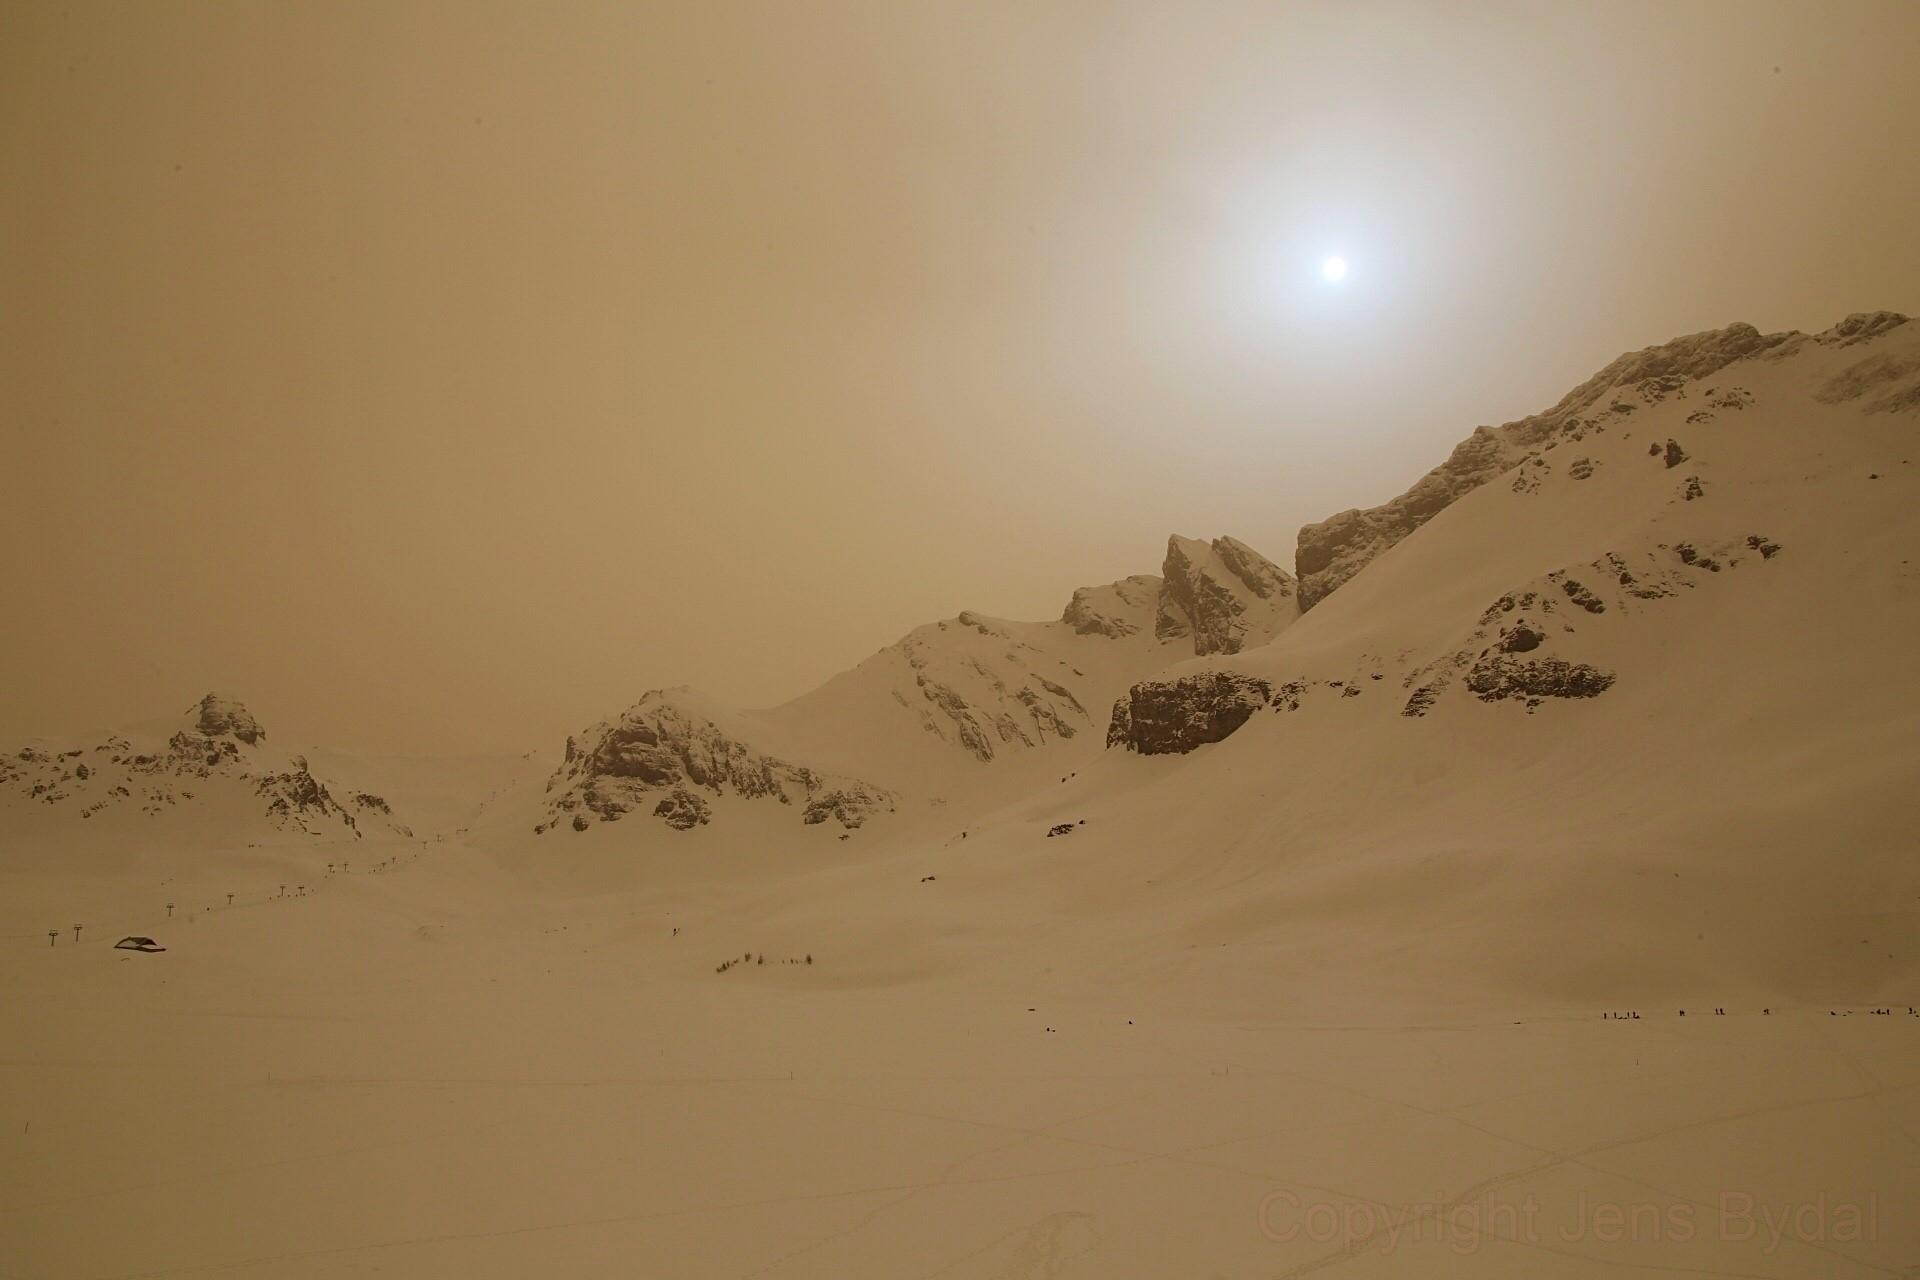 瑞士 ê Alps 山,火星 ê 天空 ft. 阿錕 (20210218)